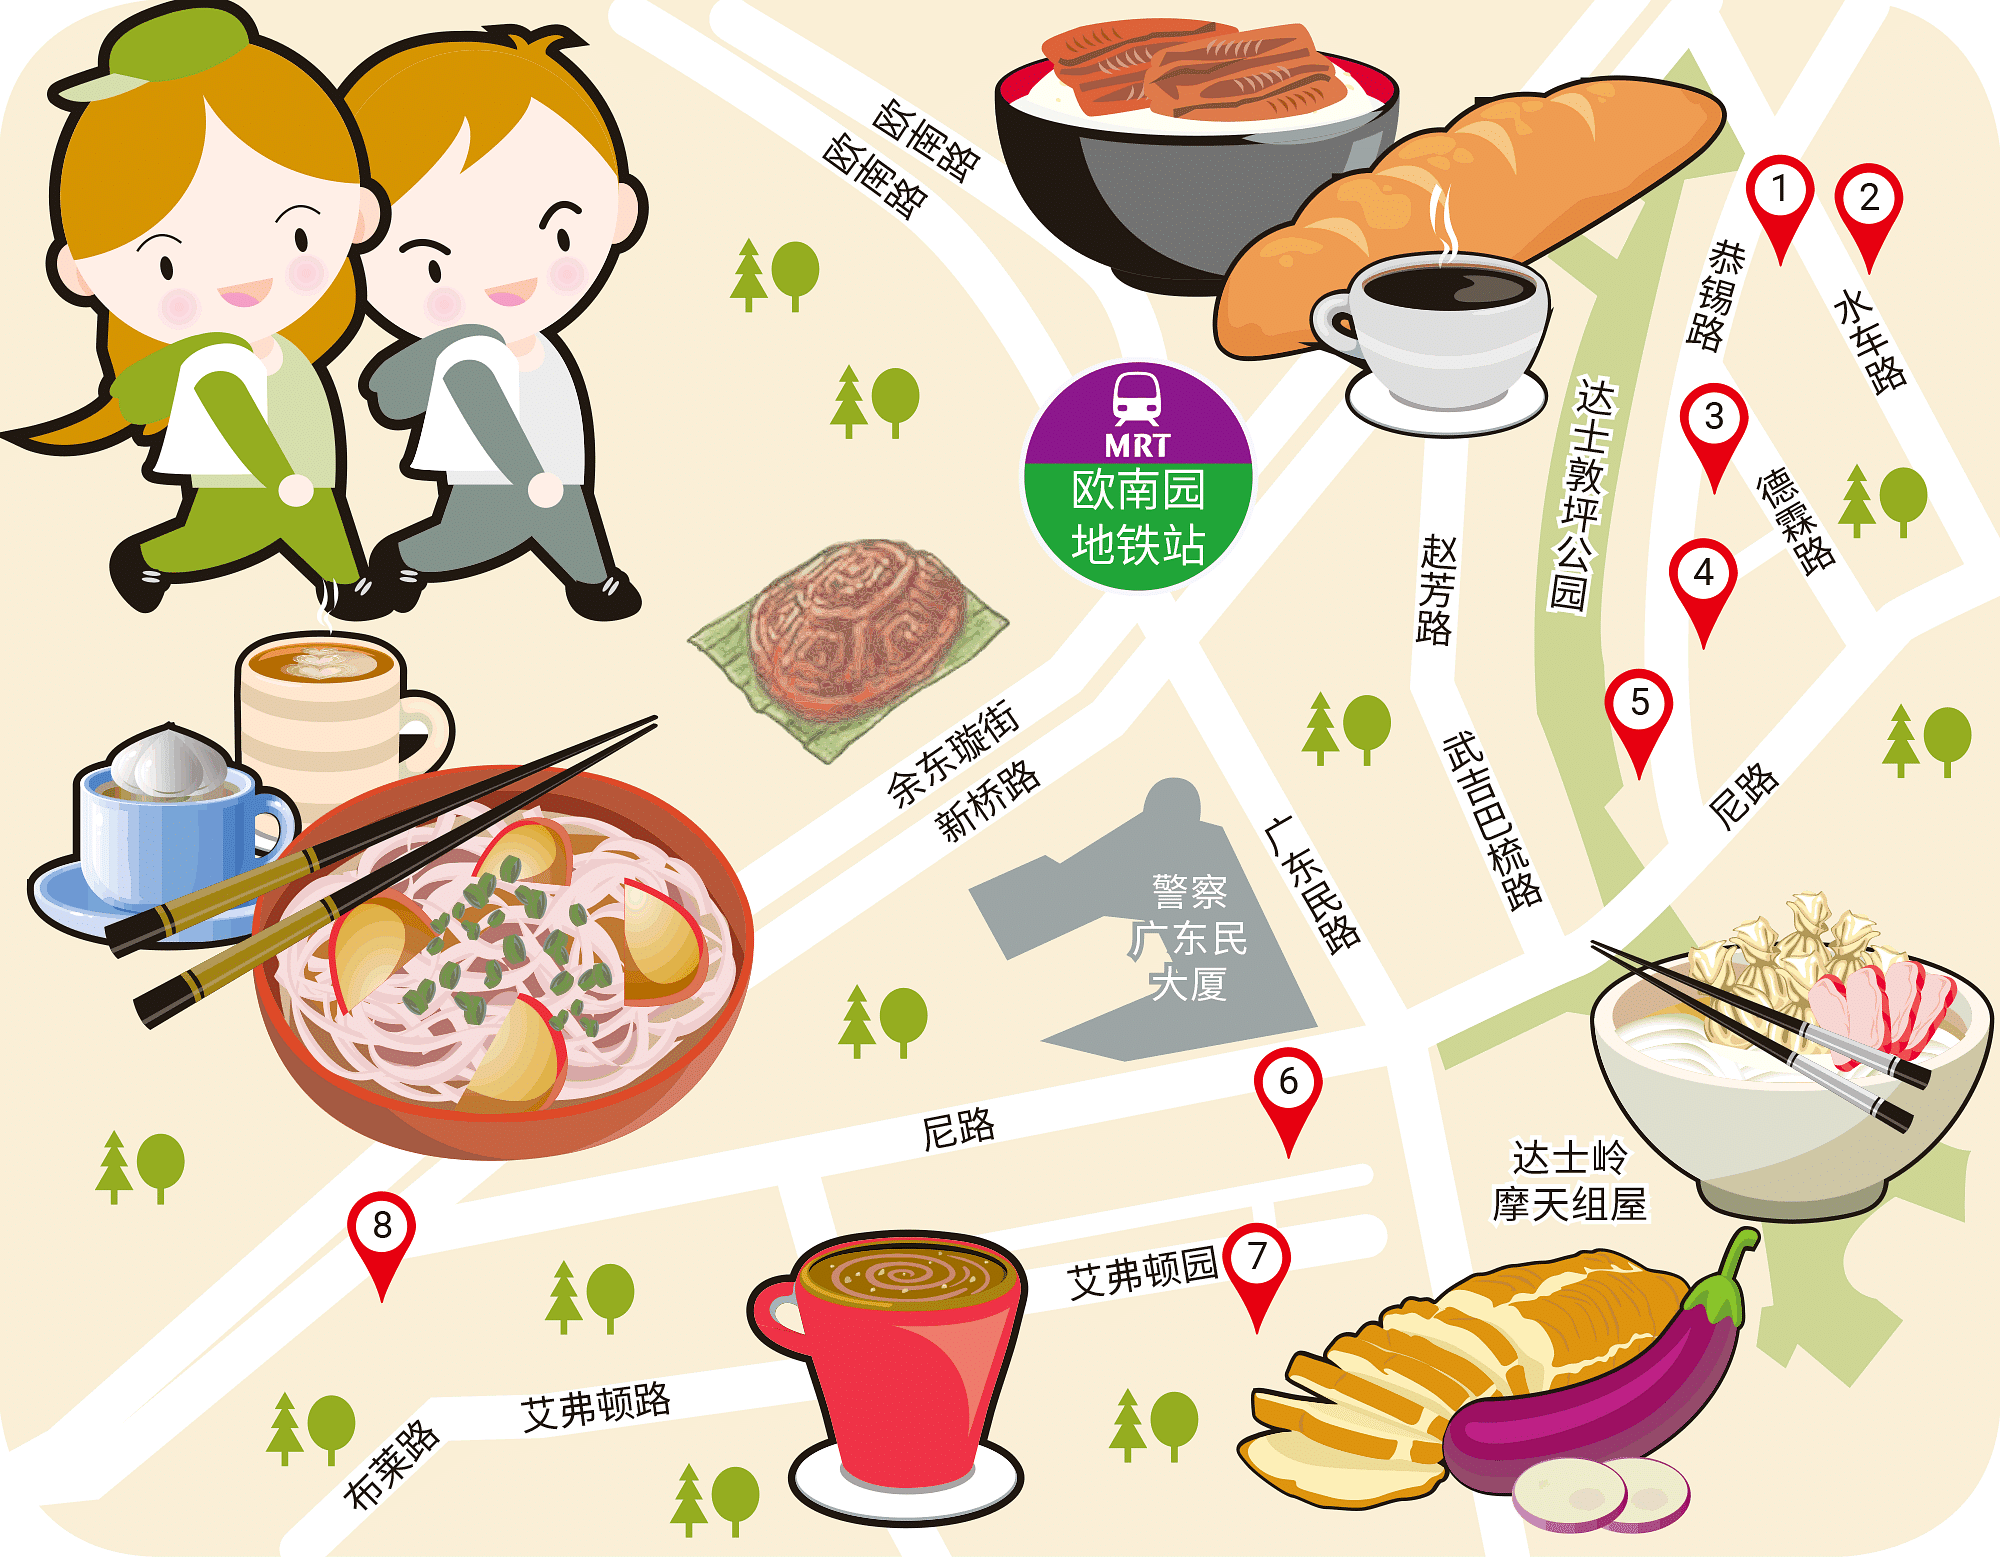 Wanbao Food Search @Outram MRT Station